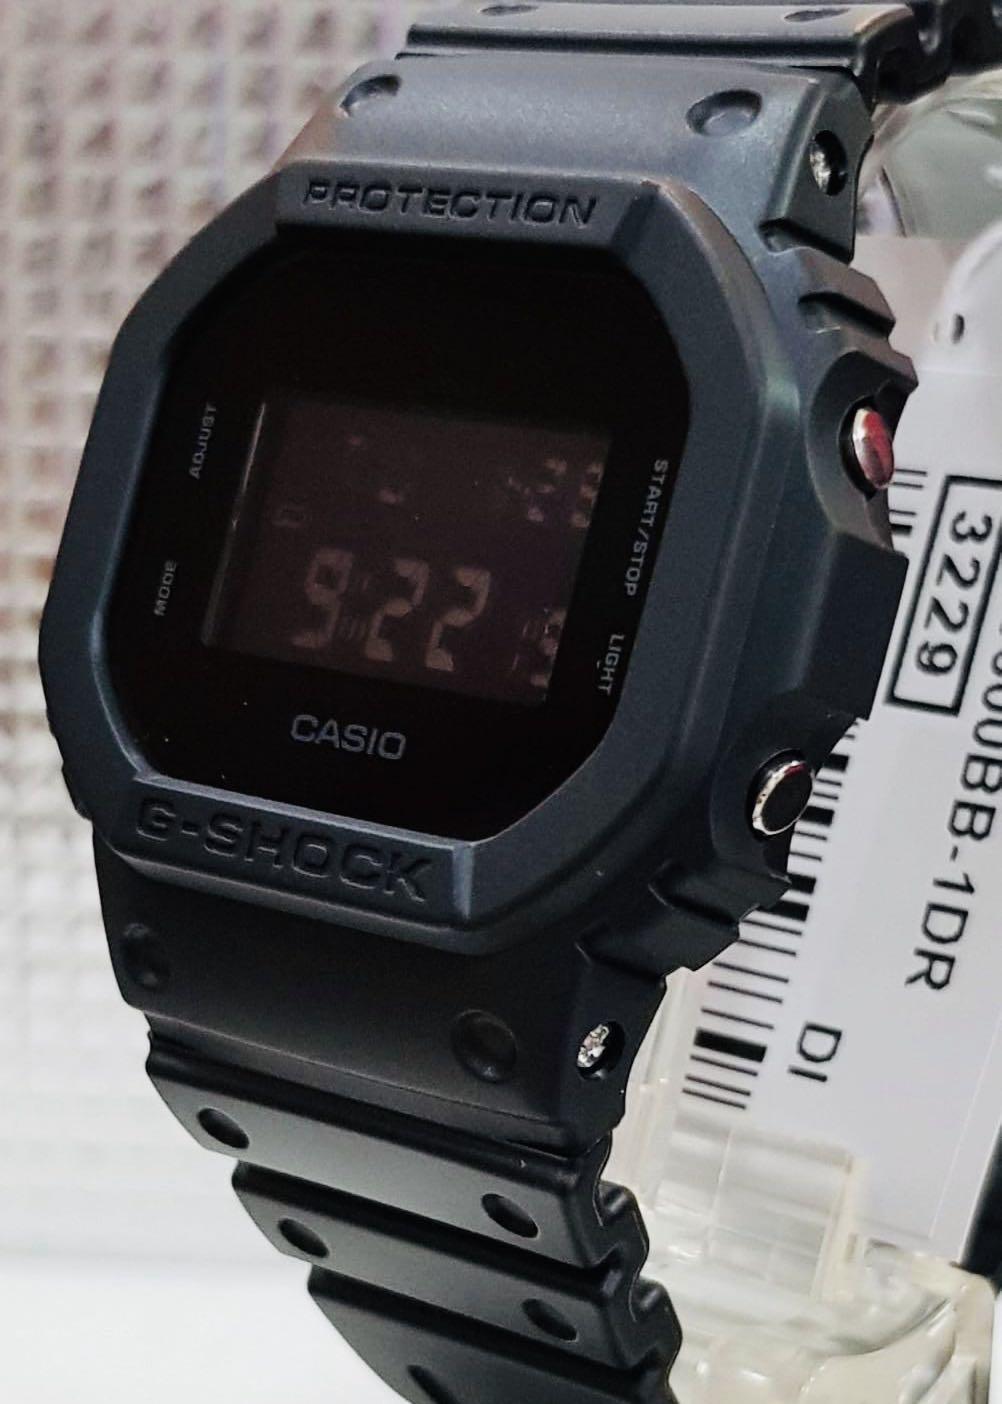 NEW🌟COUPLE💝SET : GSHOCK🌟BABYG DIVER UNISEX SPORTS WATCH  : 100% ORIGINAL AUTHENTIC CASIO BABY-G-SHOCK : DW-5600BB-1 + GA-100BR-1A